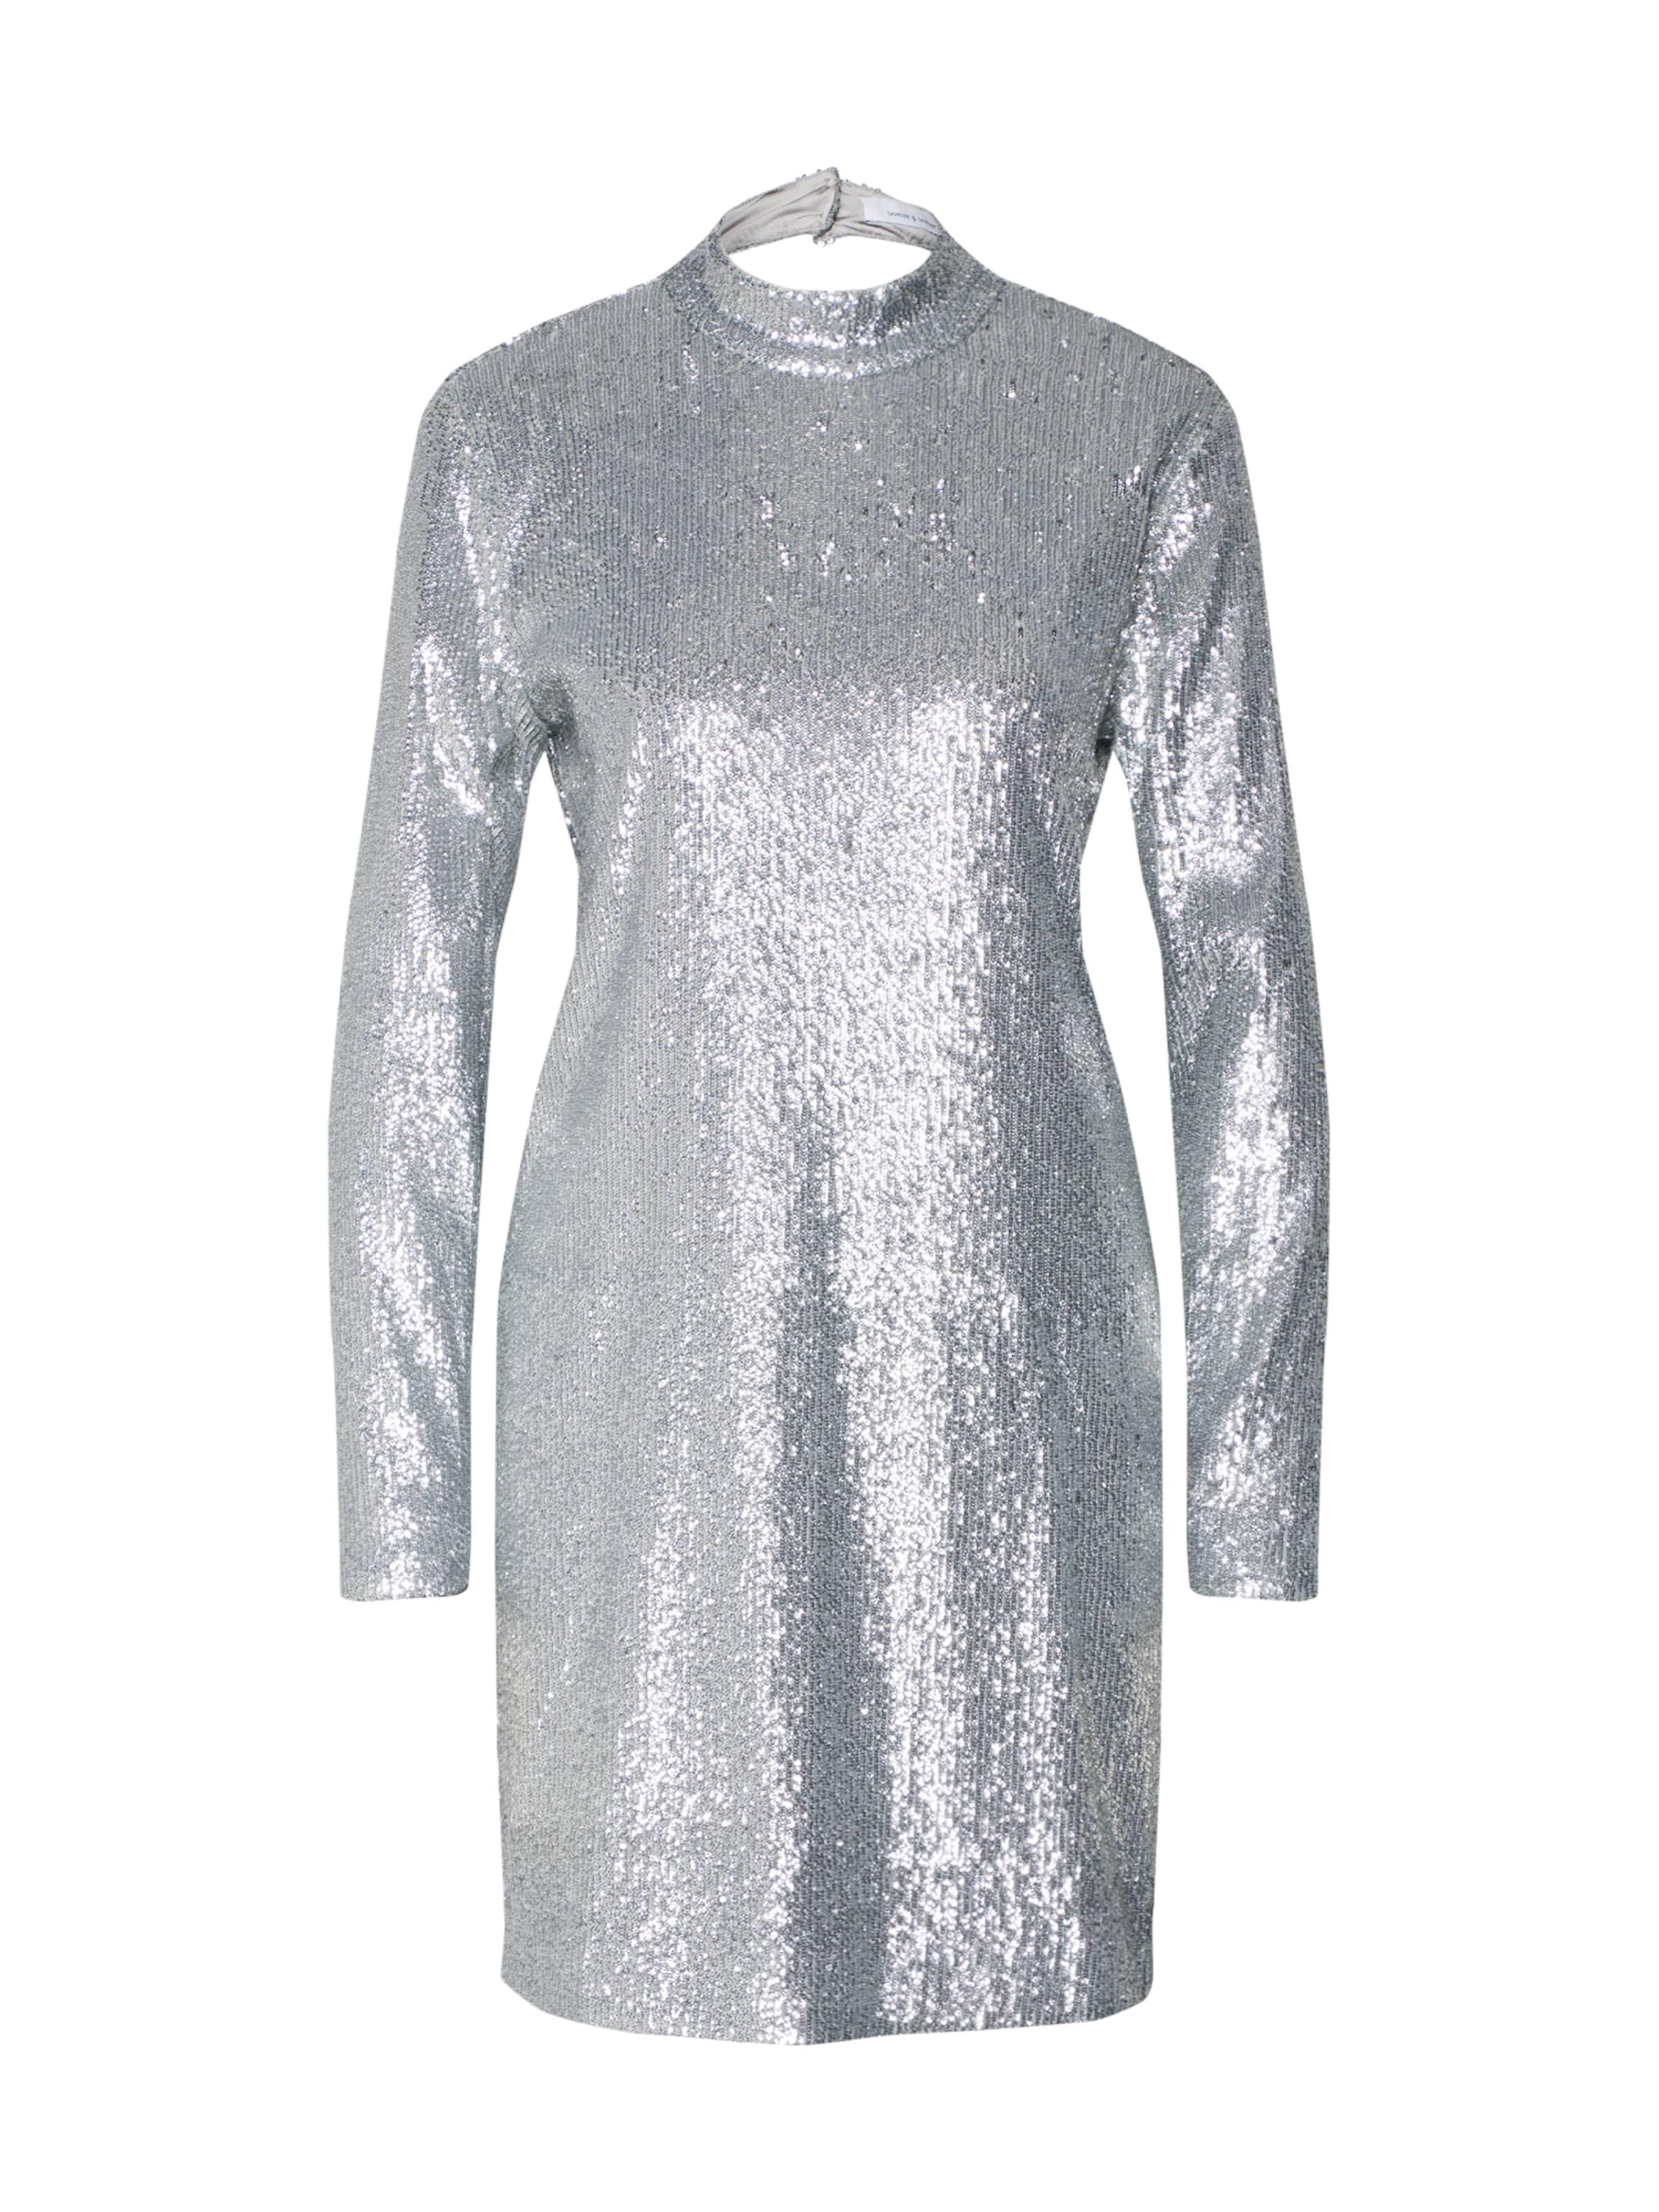 Tn amp; En Samsoe 10440' Dress Cocktail De Argent 'theta Robe Xff8qd